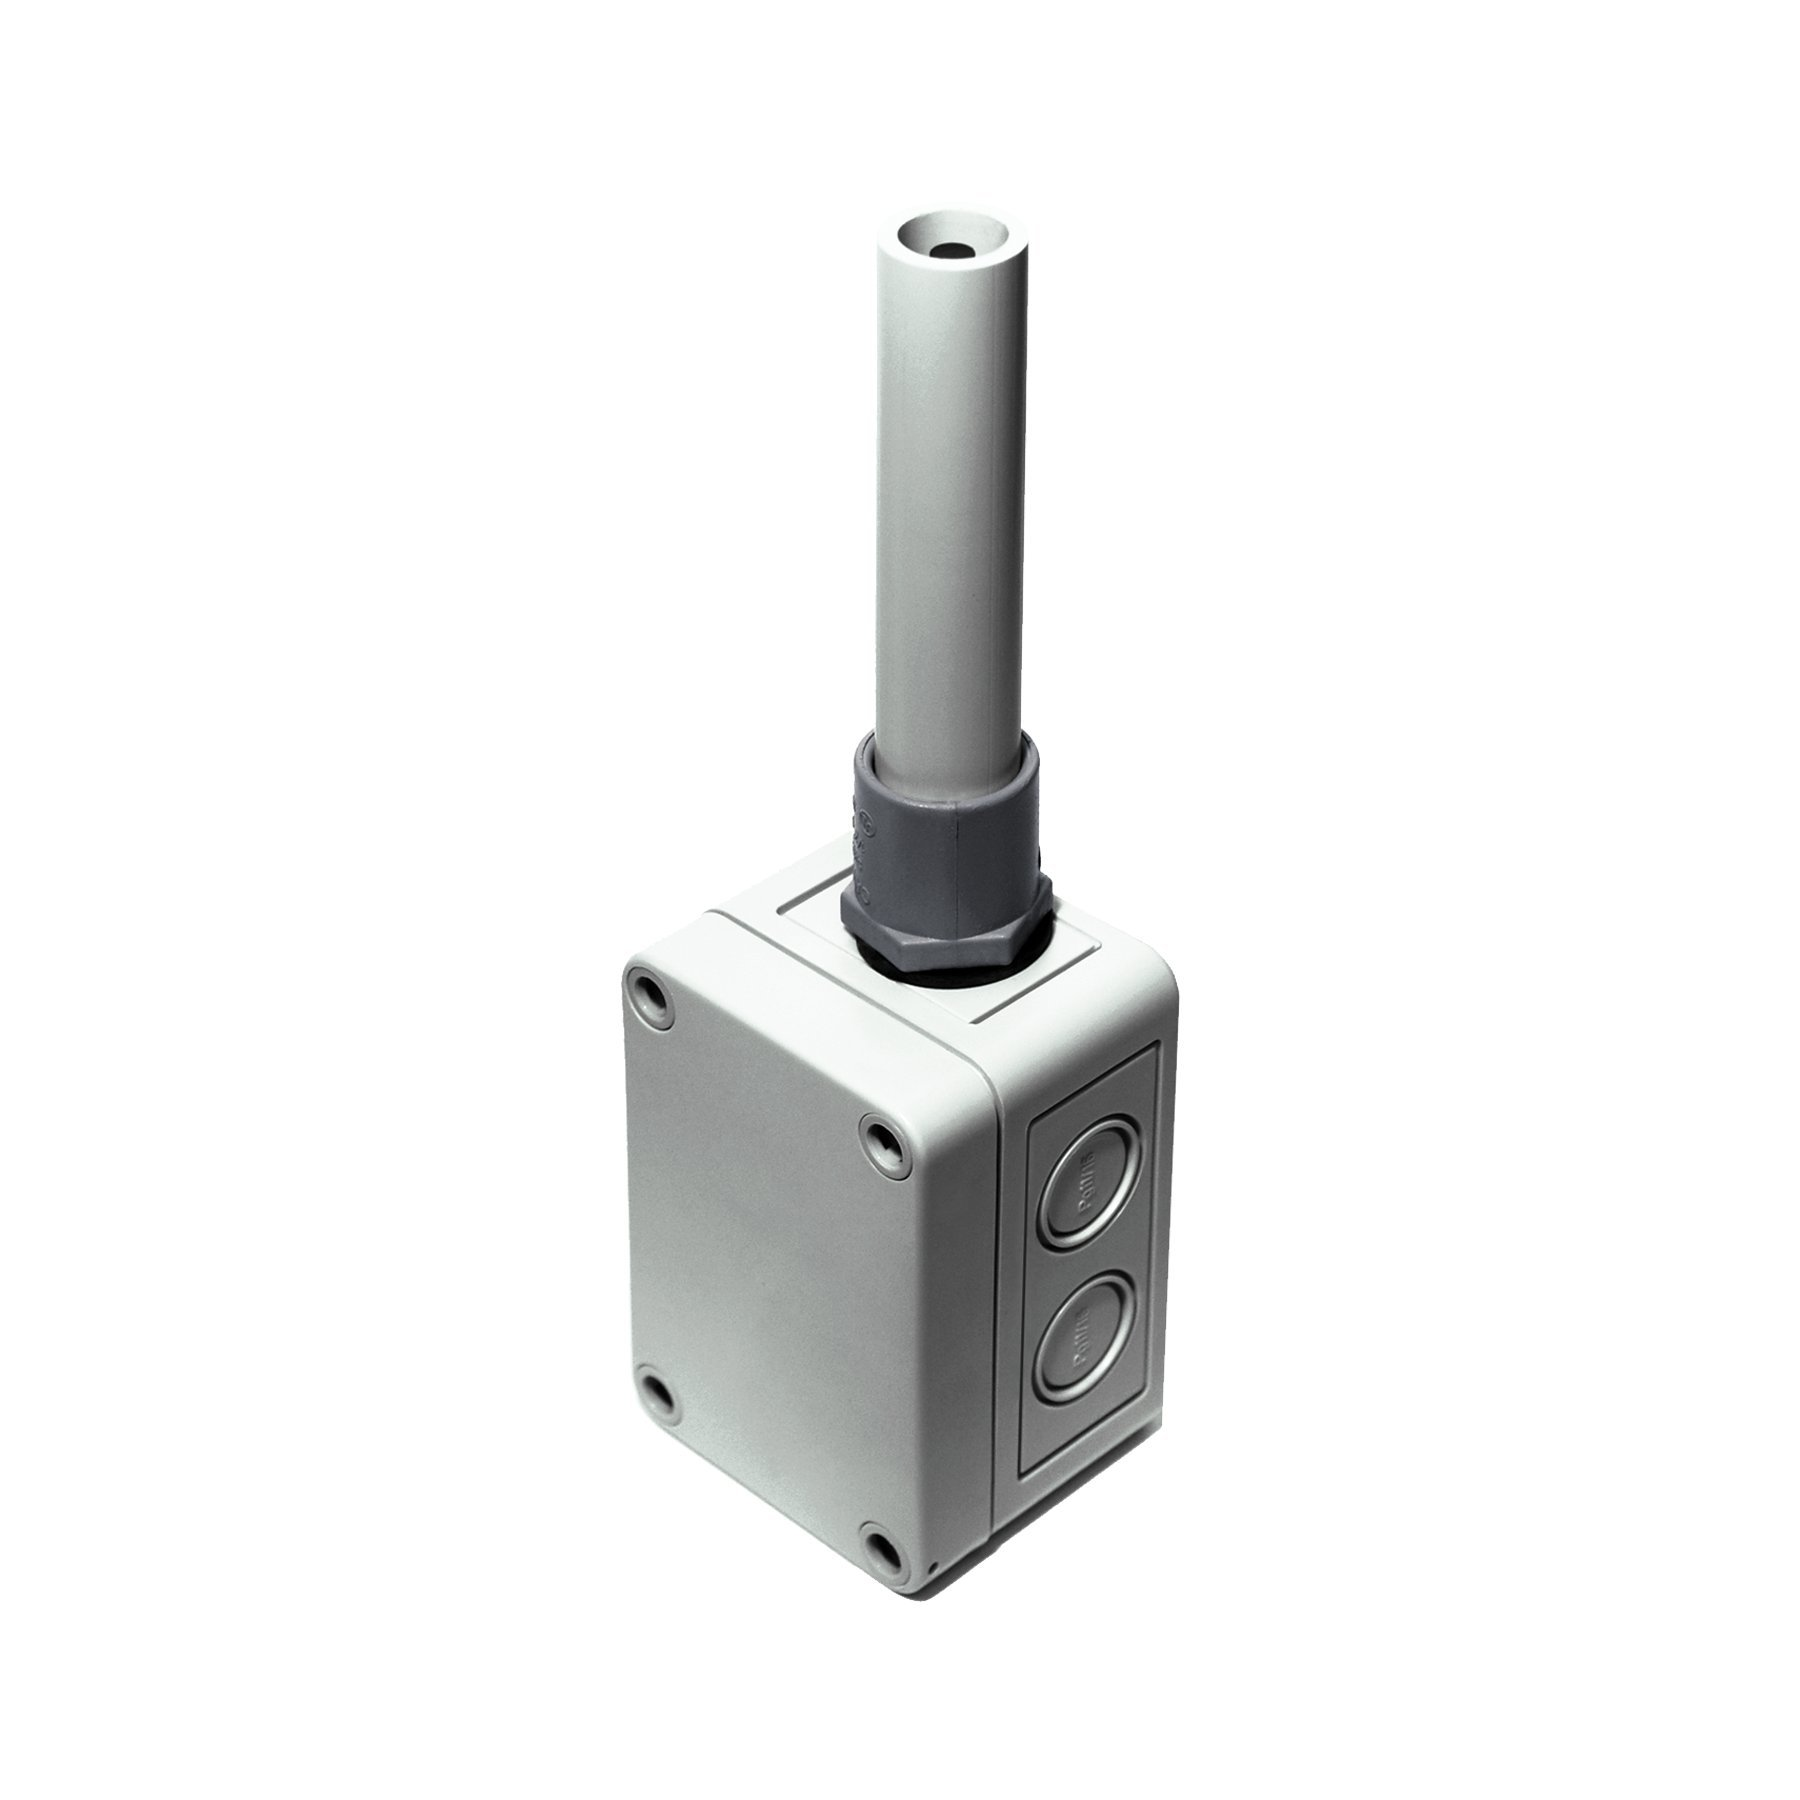 A/TT1K-O-4X | ACI | Analog VDC or mA | Outdoor Outside Air Temperature Sensor | NEMA 4X Housing Enclosure Box |